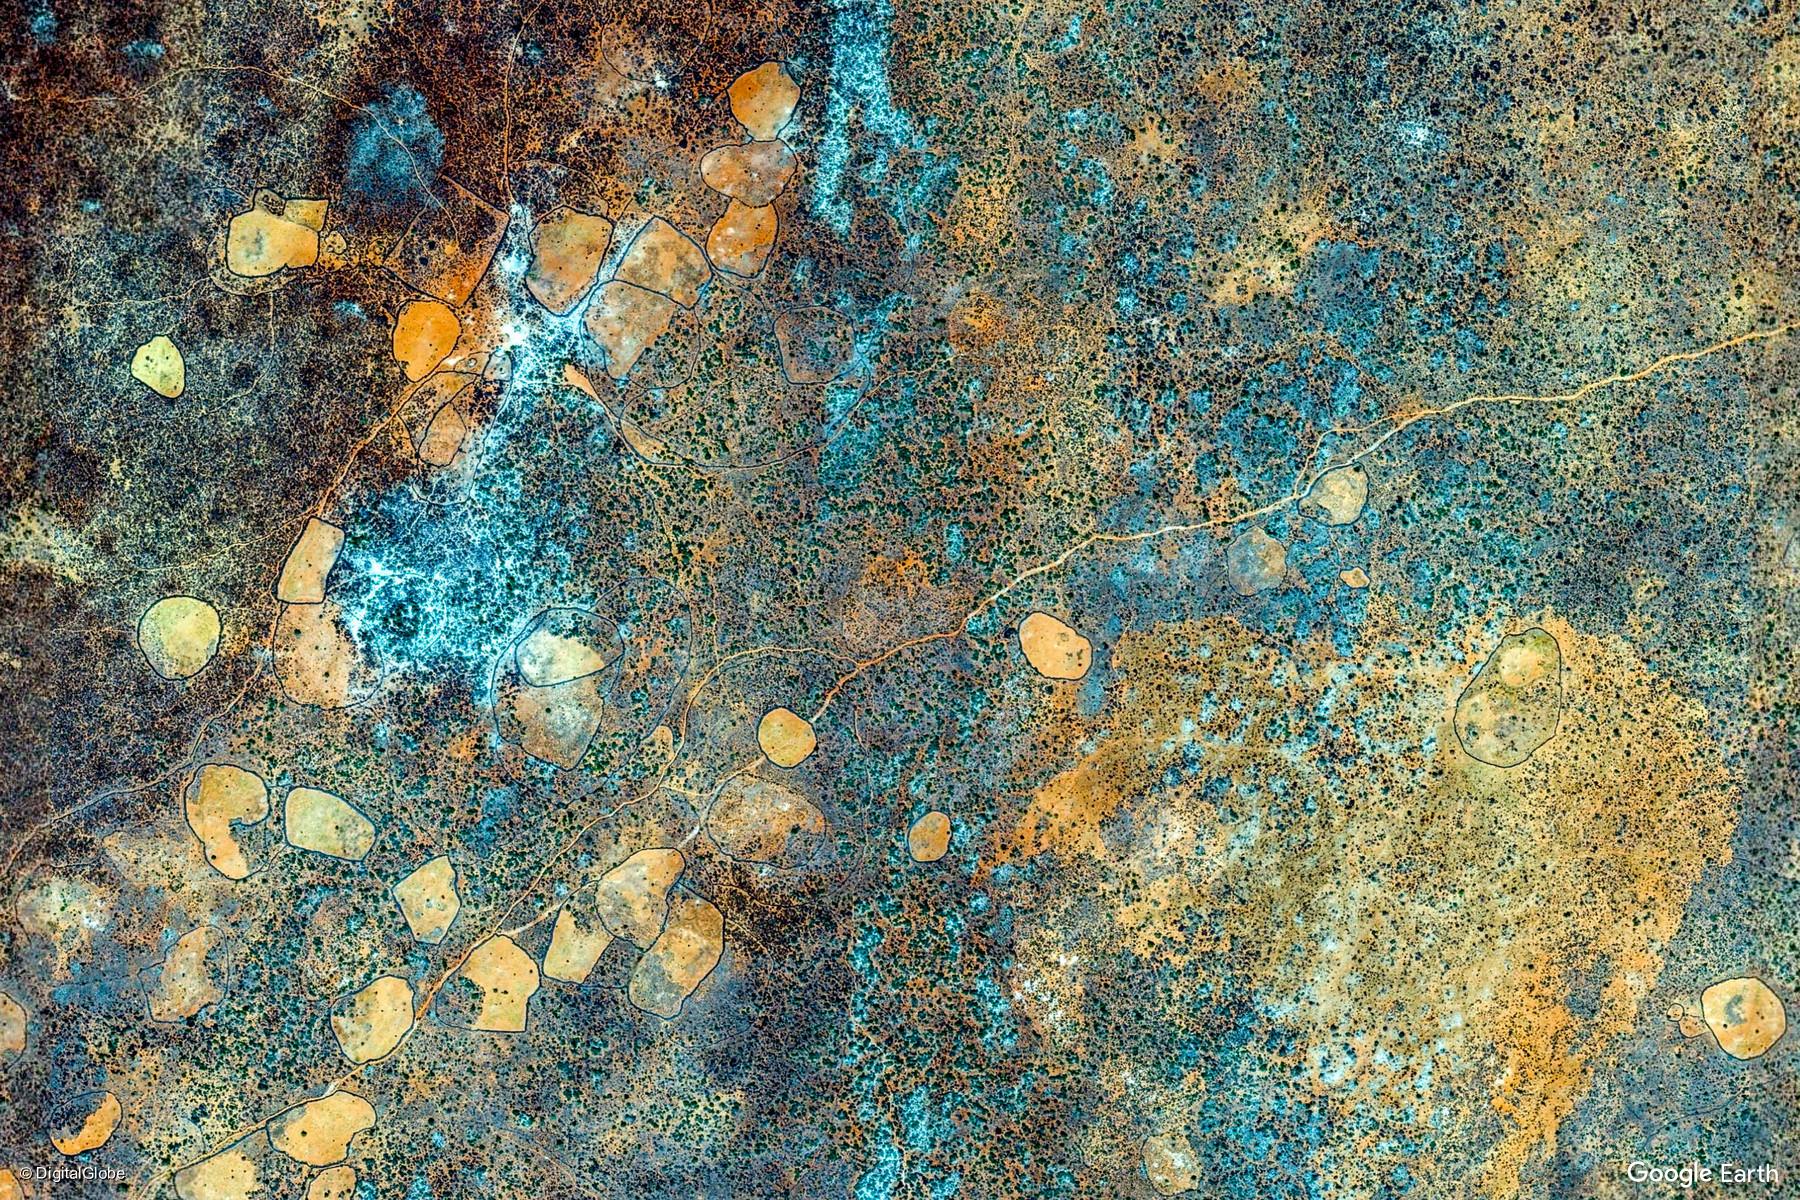 bulo burte somalia earth view from google